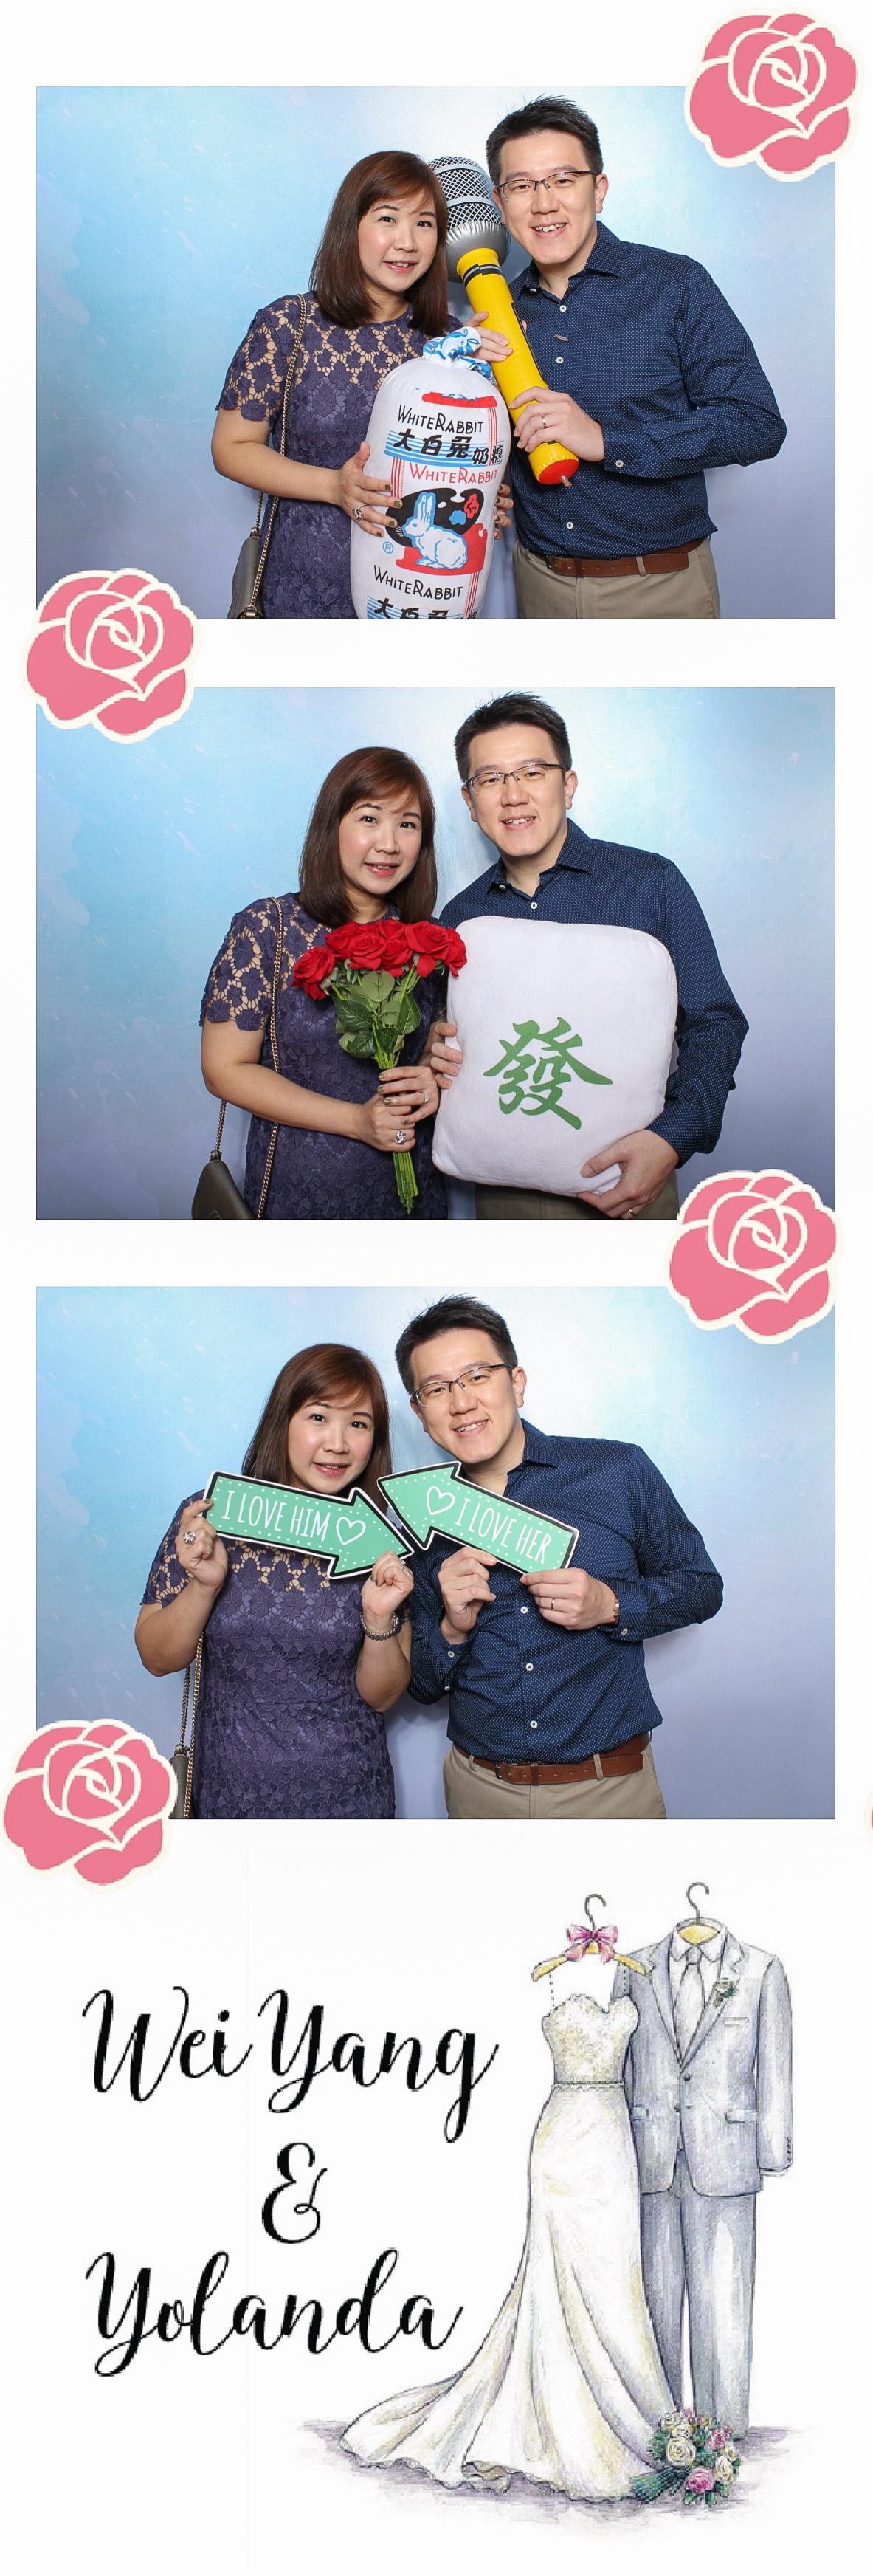 Photobooth 1706-4